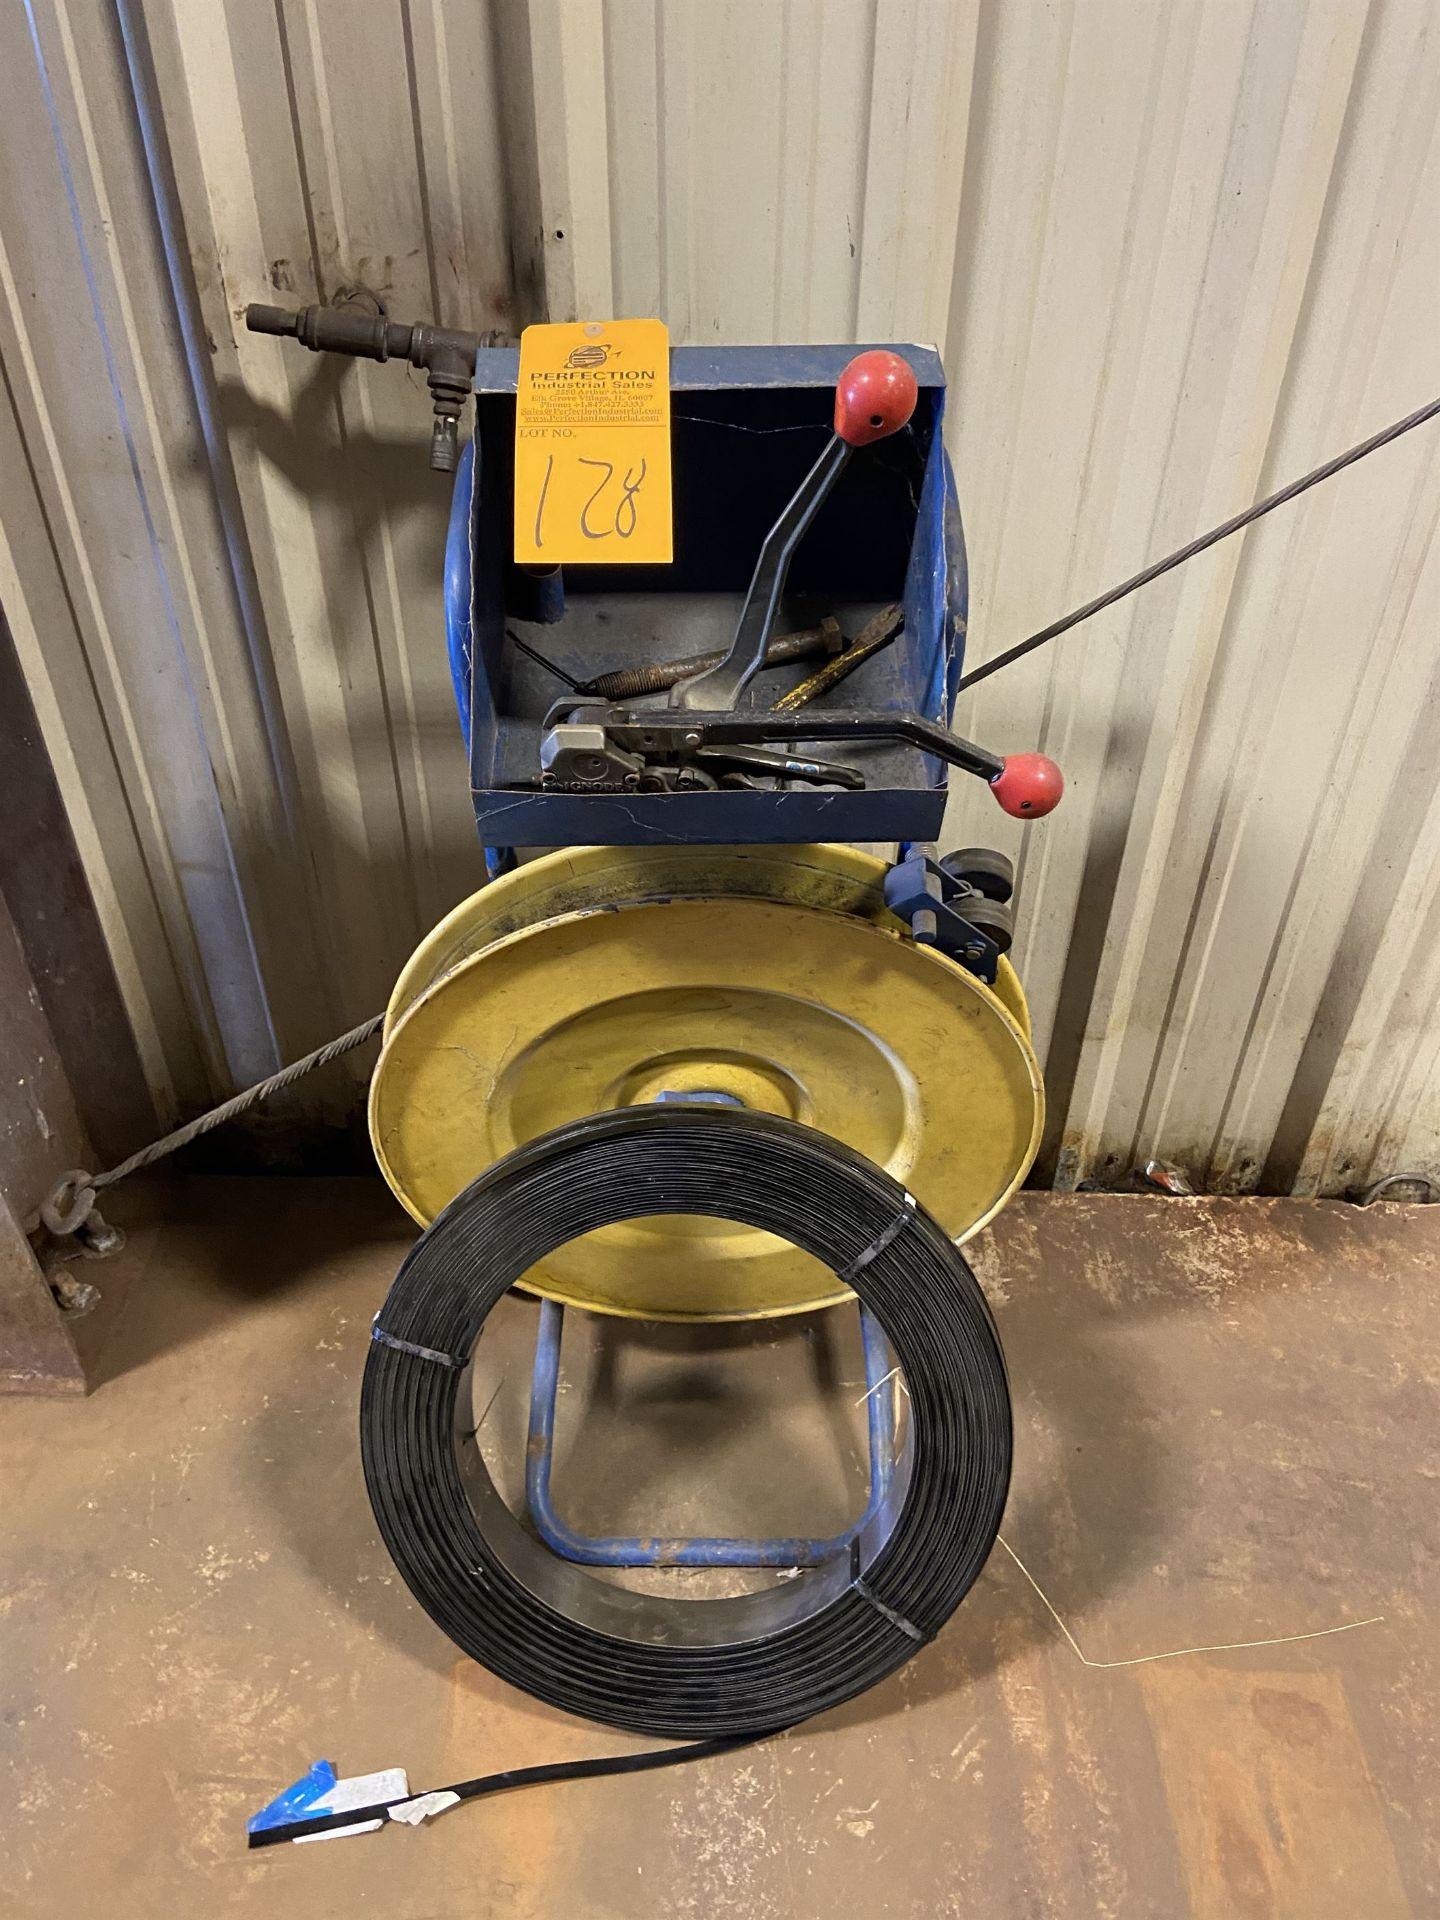 Banding cart with Metal Banding